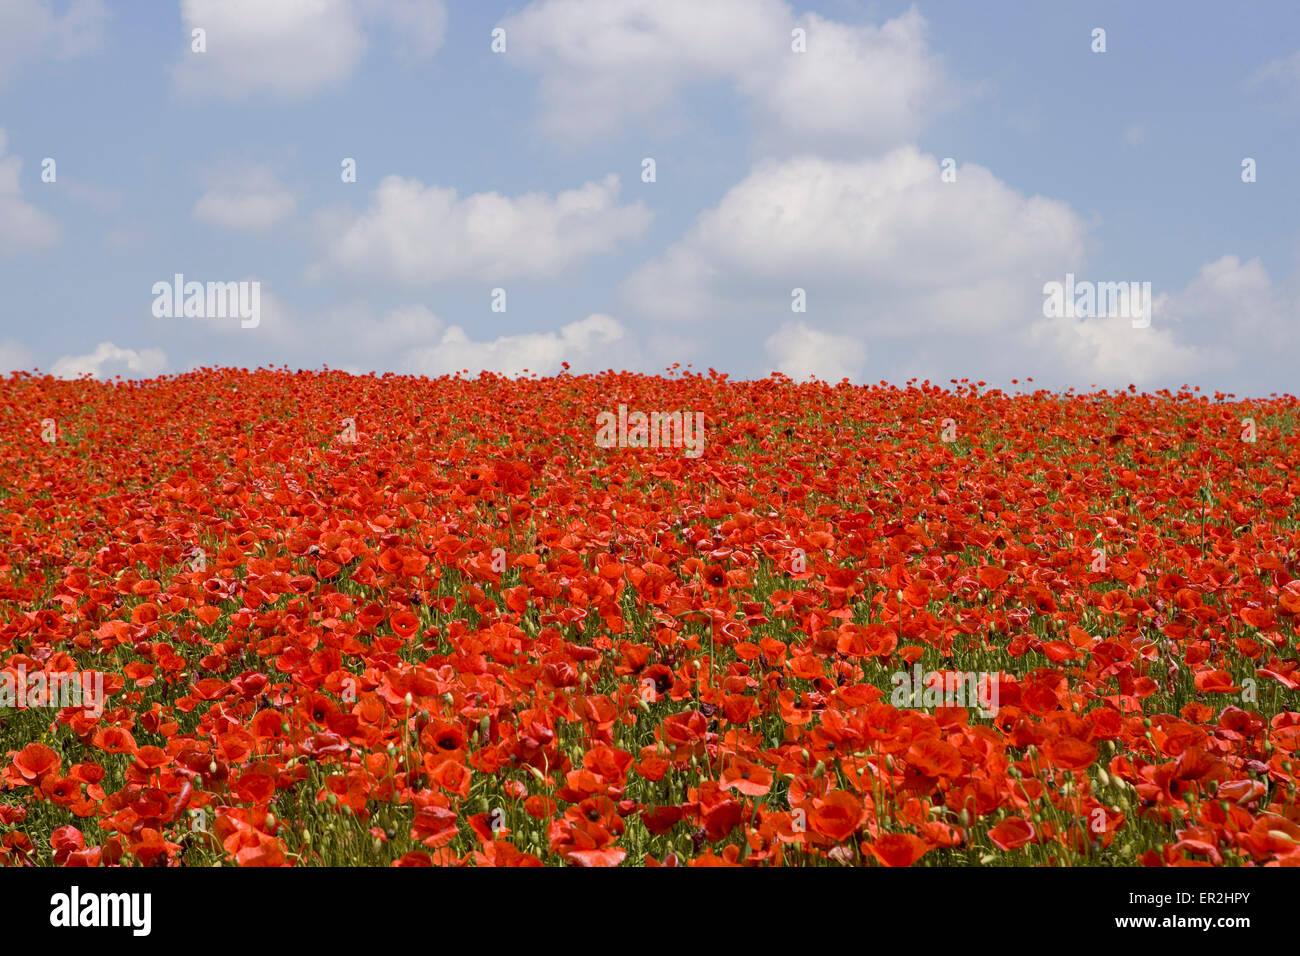 Landschaft, Blumenwiese, Mohn, bluehen, Natur, Huegel, Wiesen, Felder, Weite, Ferne, Aussicht, Horizont, Vegetation, - Stock Image